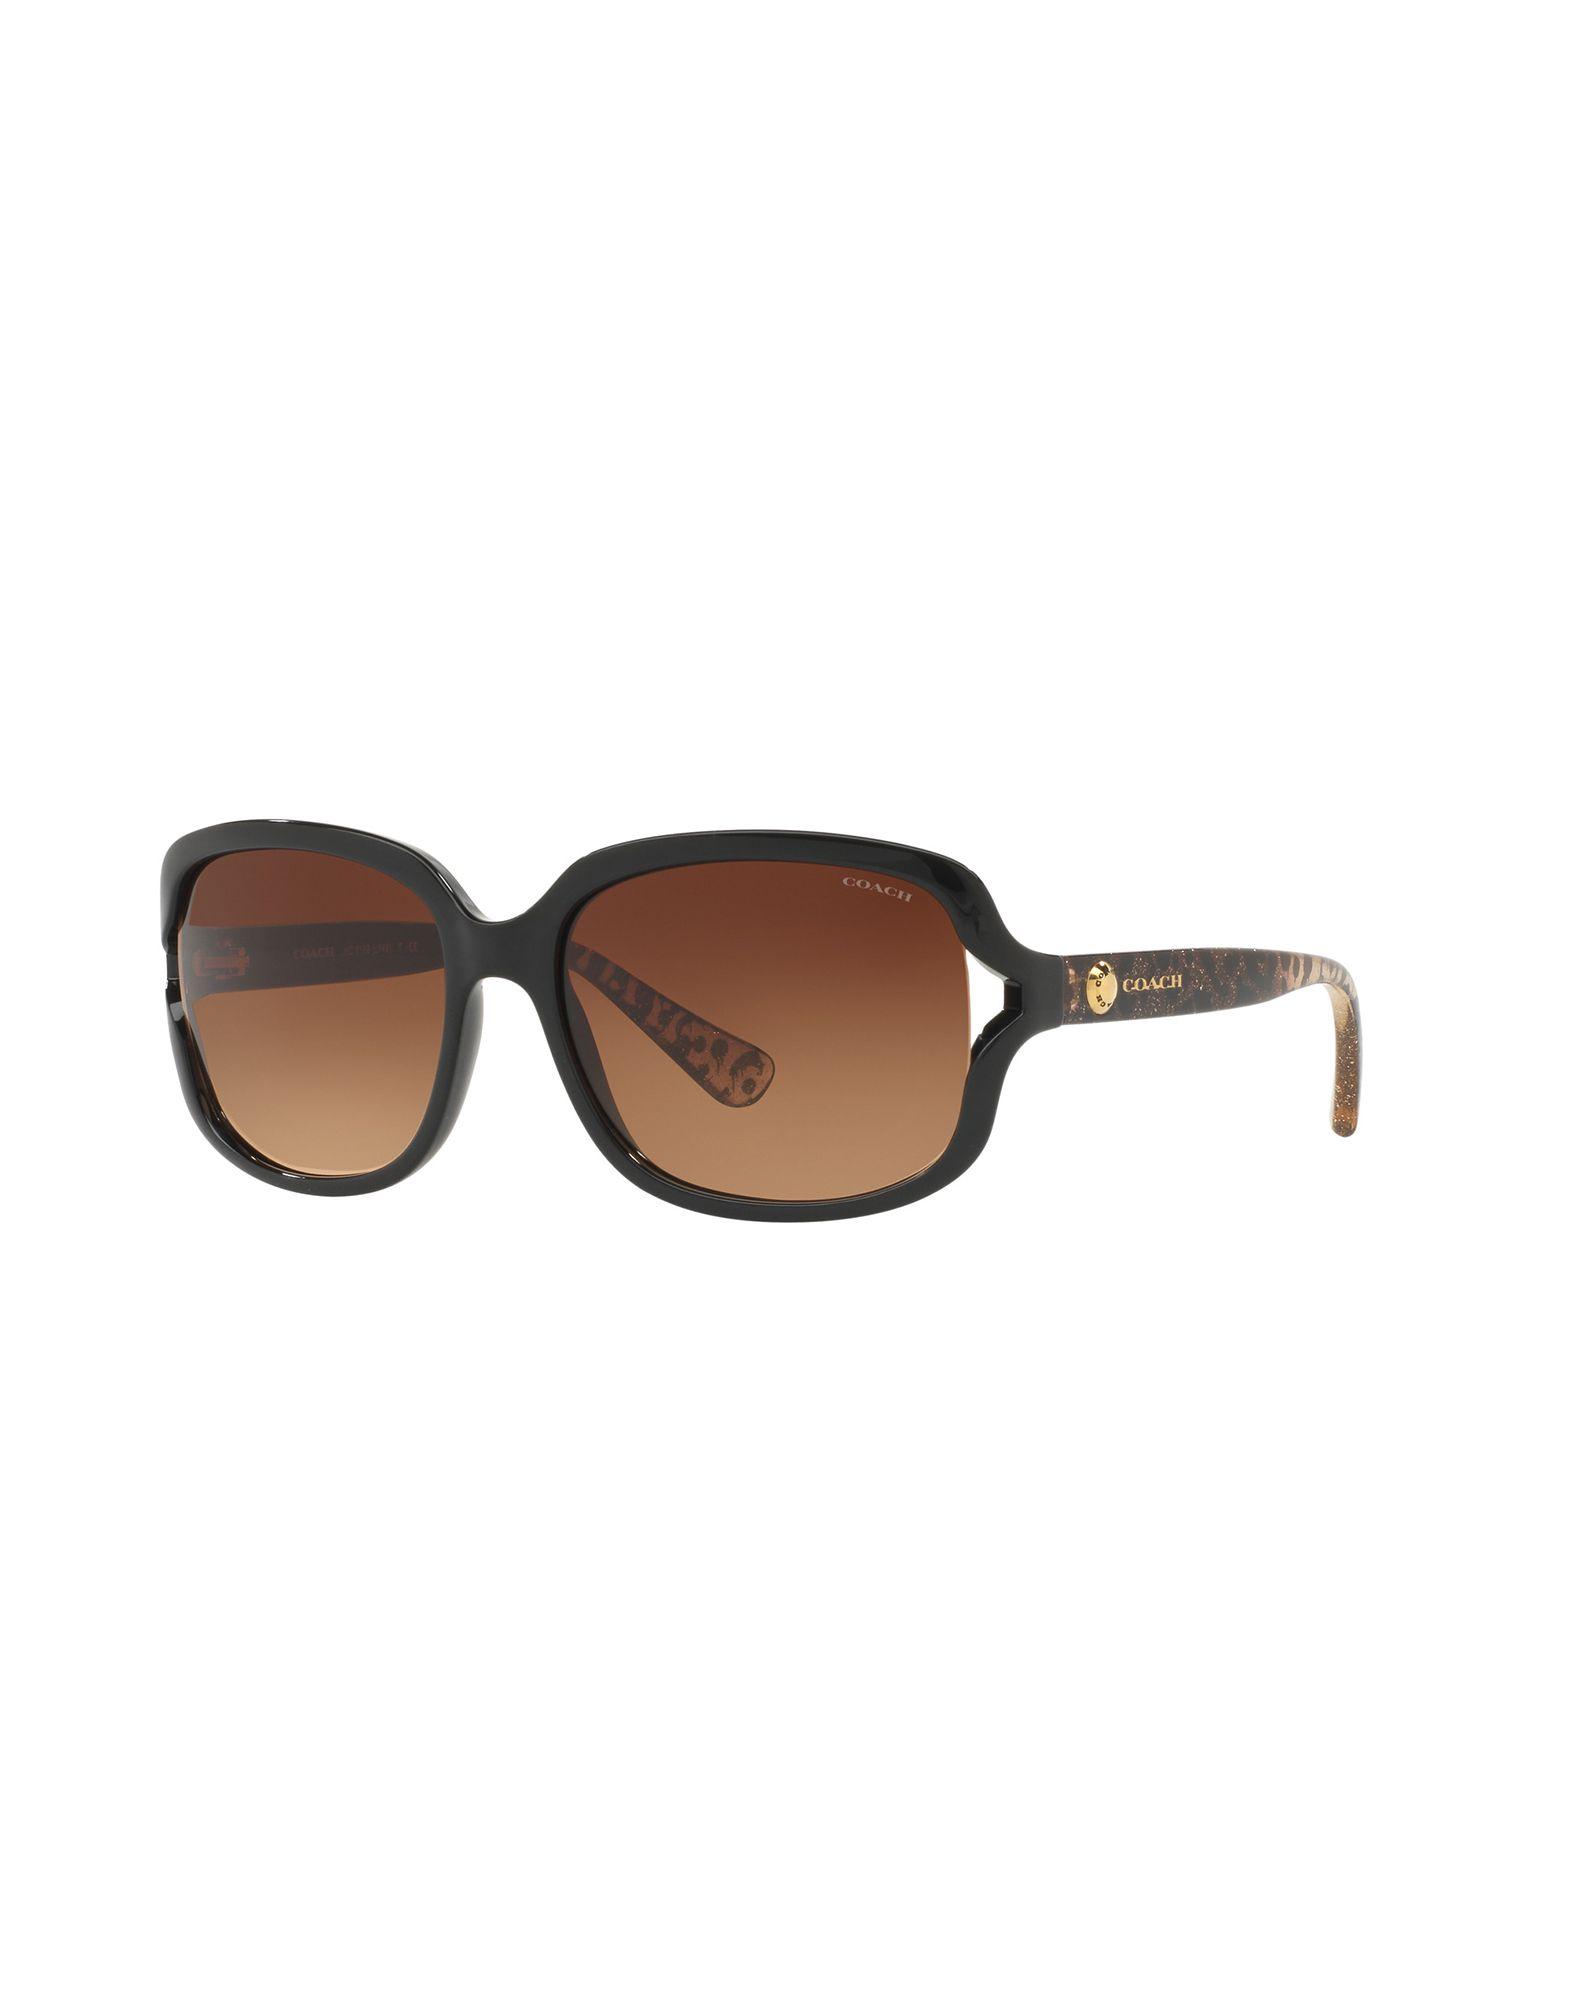 COACH Солнечные очки web eyewear солнечные очки